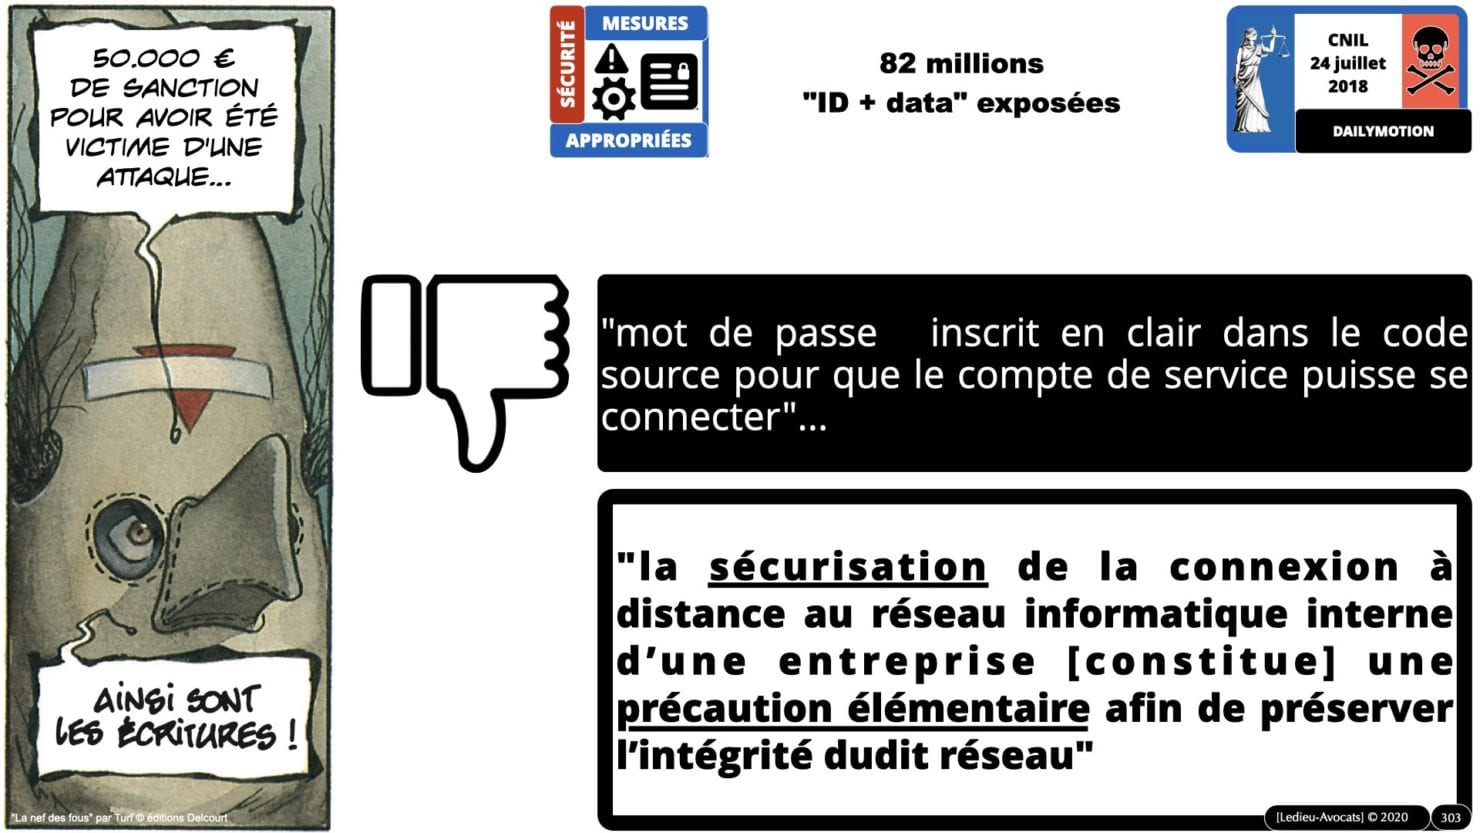 RGPD e-Privacy principes actualité jurisprudence ©Ledieu-Avocats 25-06-2021.303